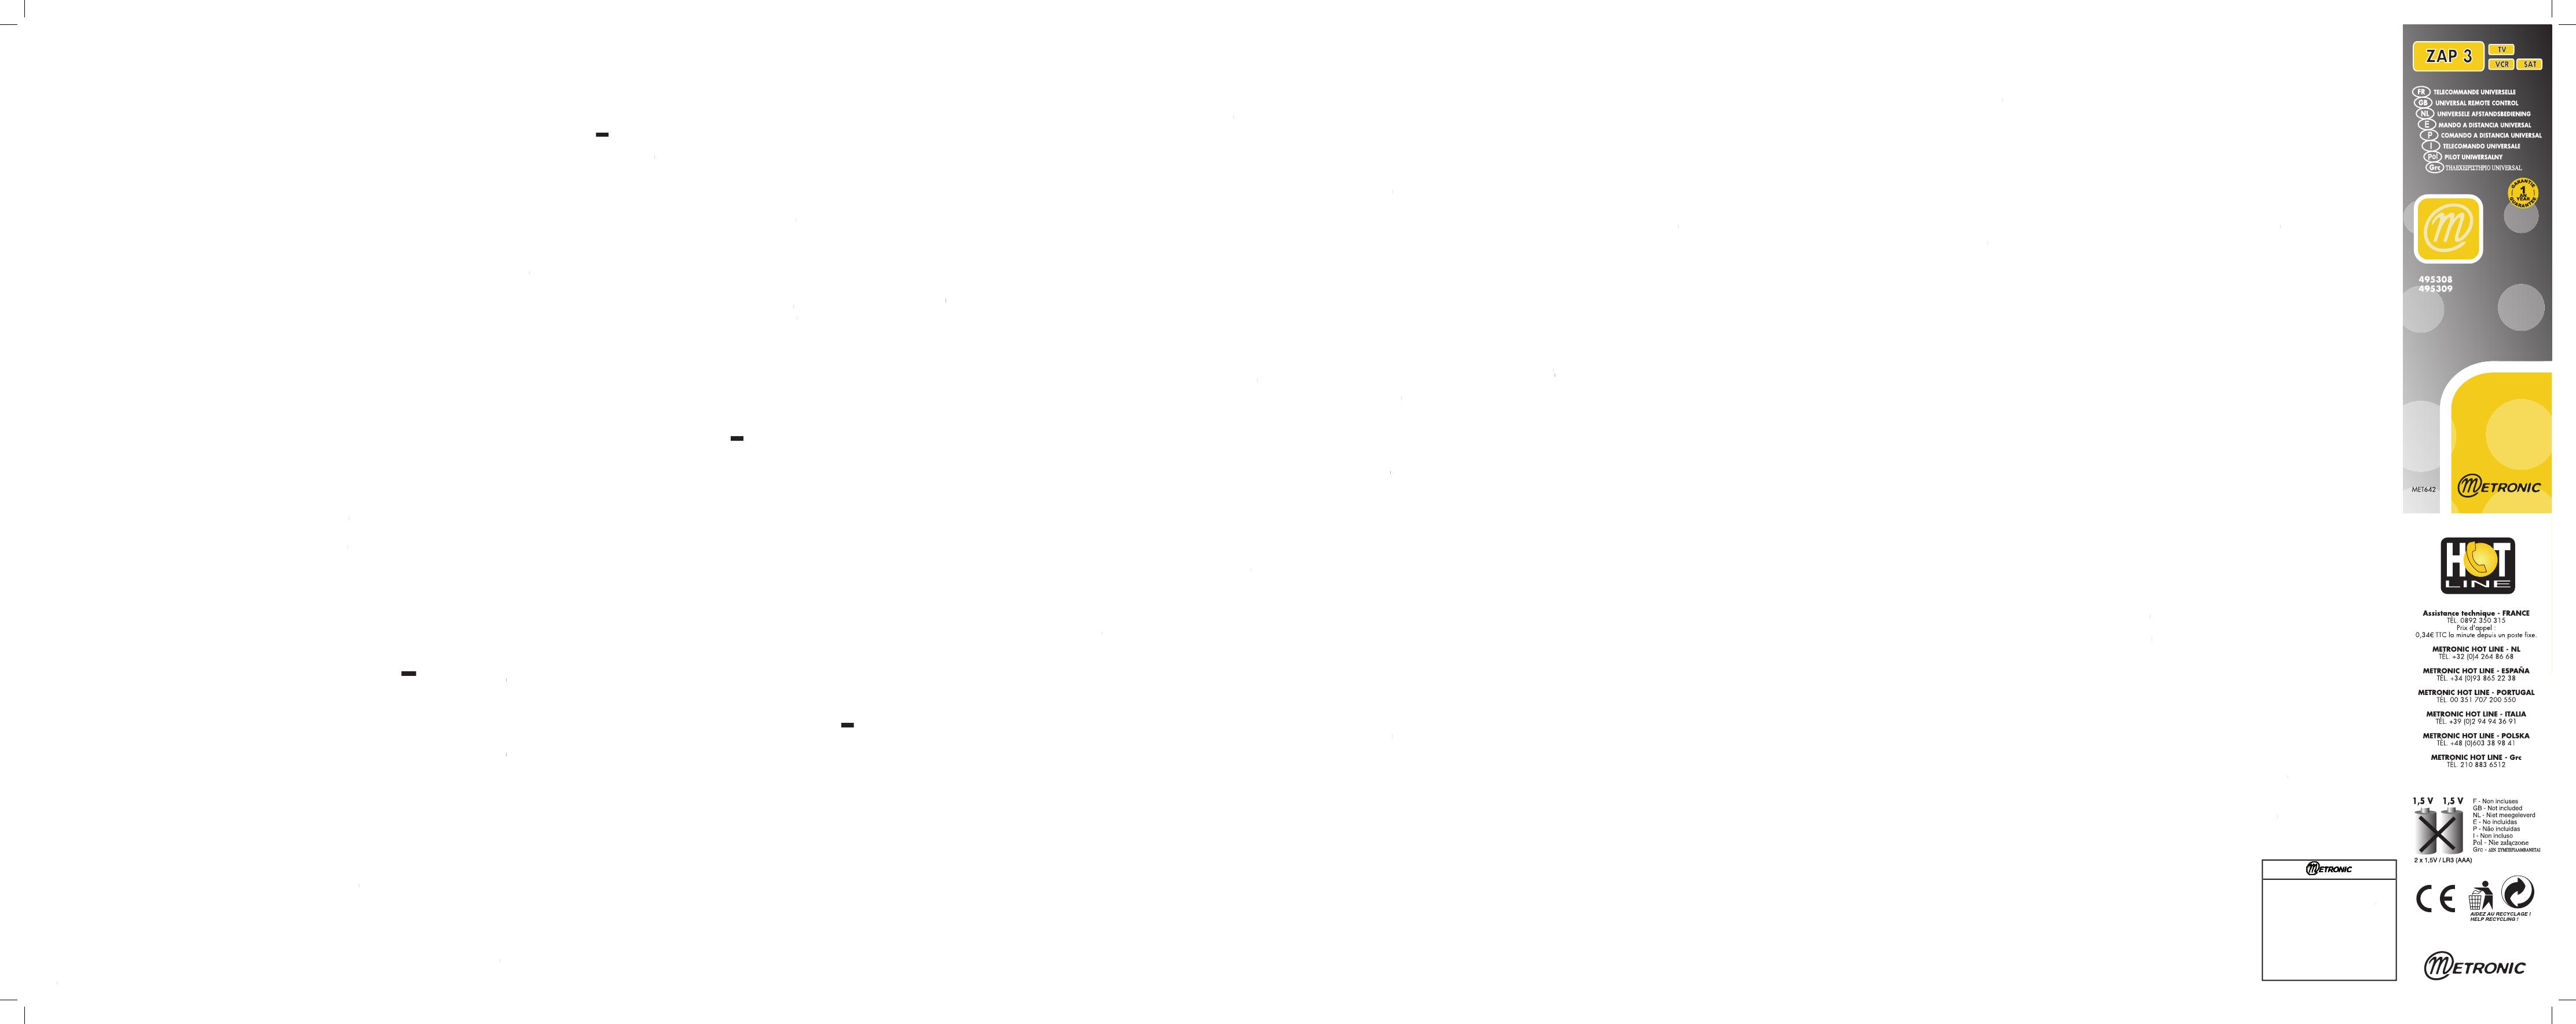 Handleiding Metronic ZAP 3 - 495309 (pagina 1 van 2) (English ...